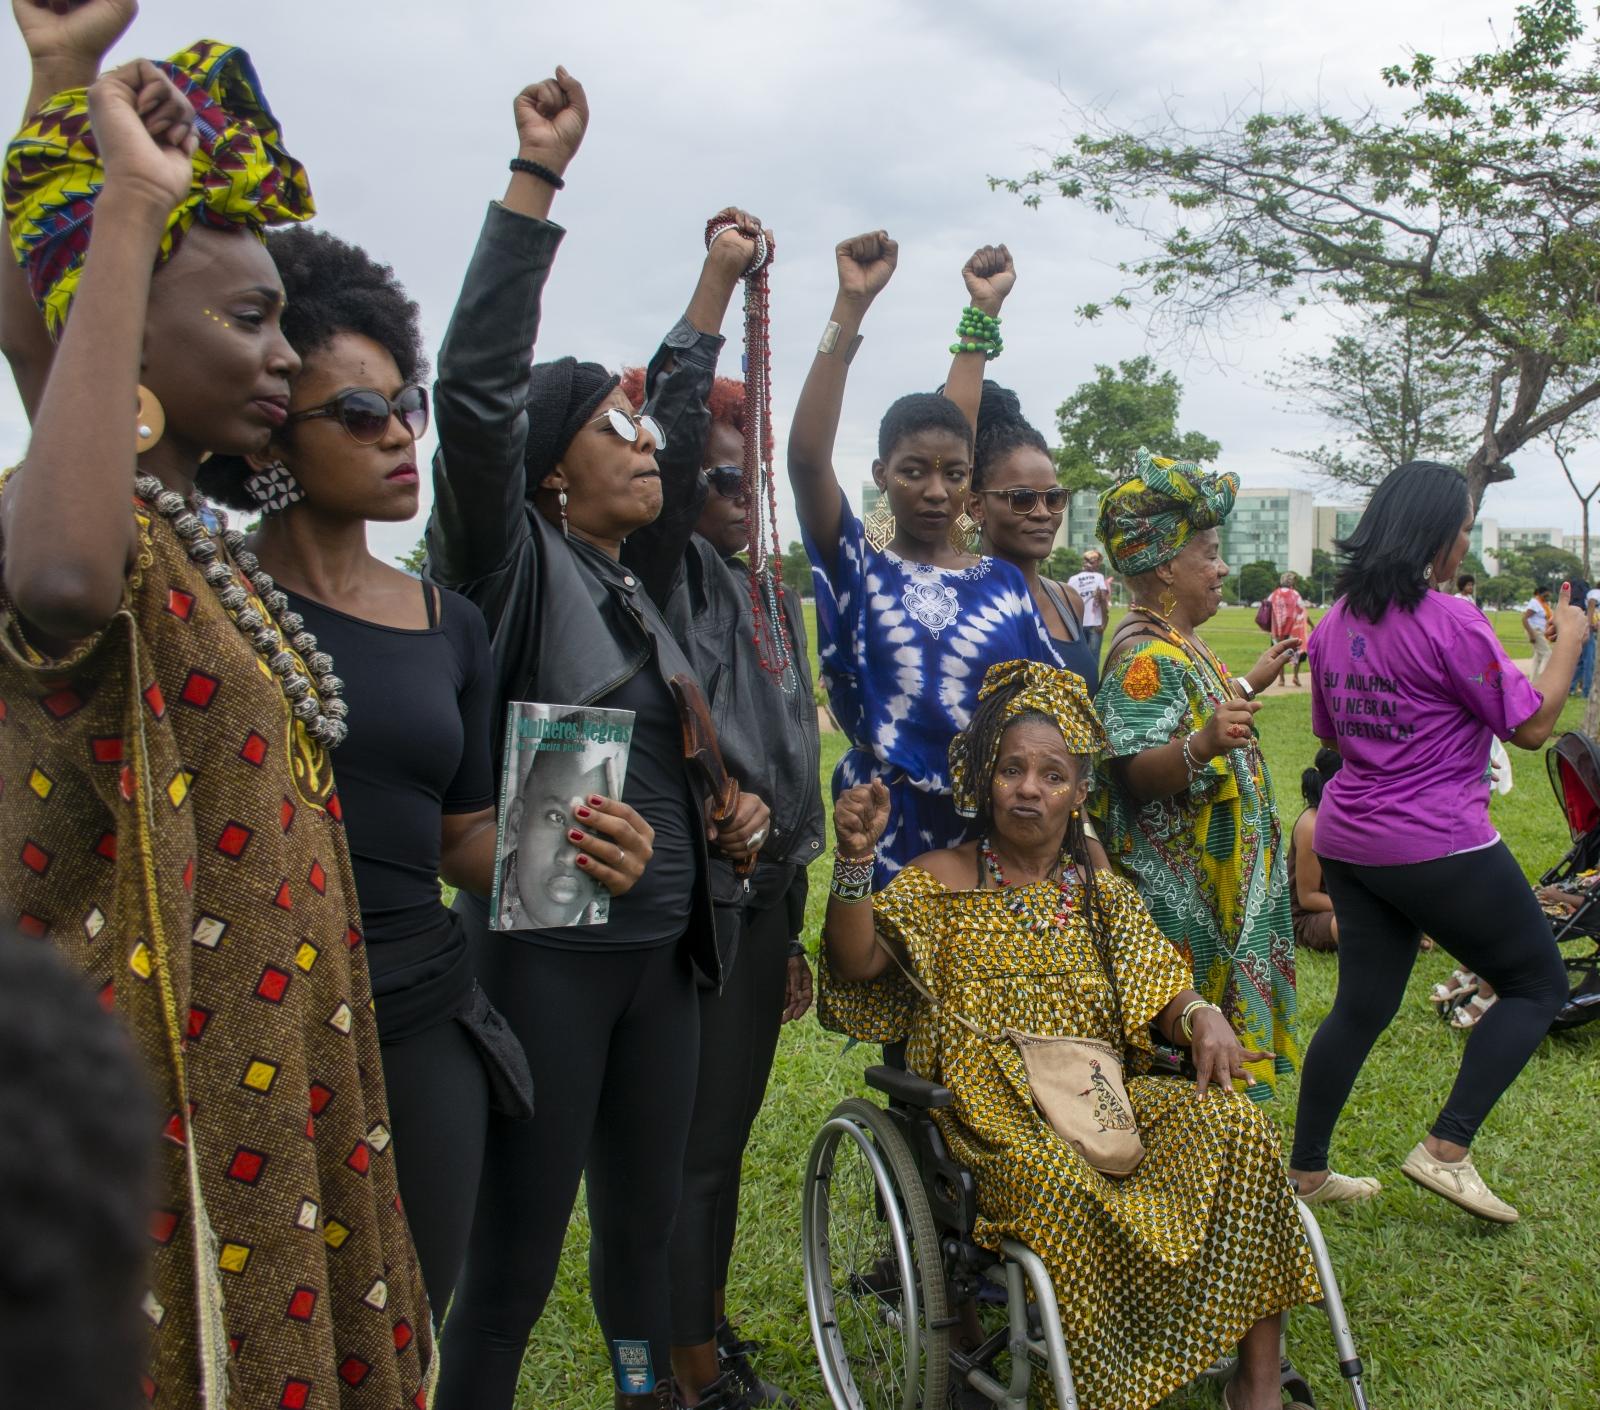 Photography image - Protest: Brazil, 2016 - Black Liberation